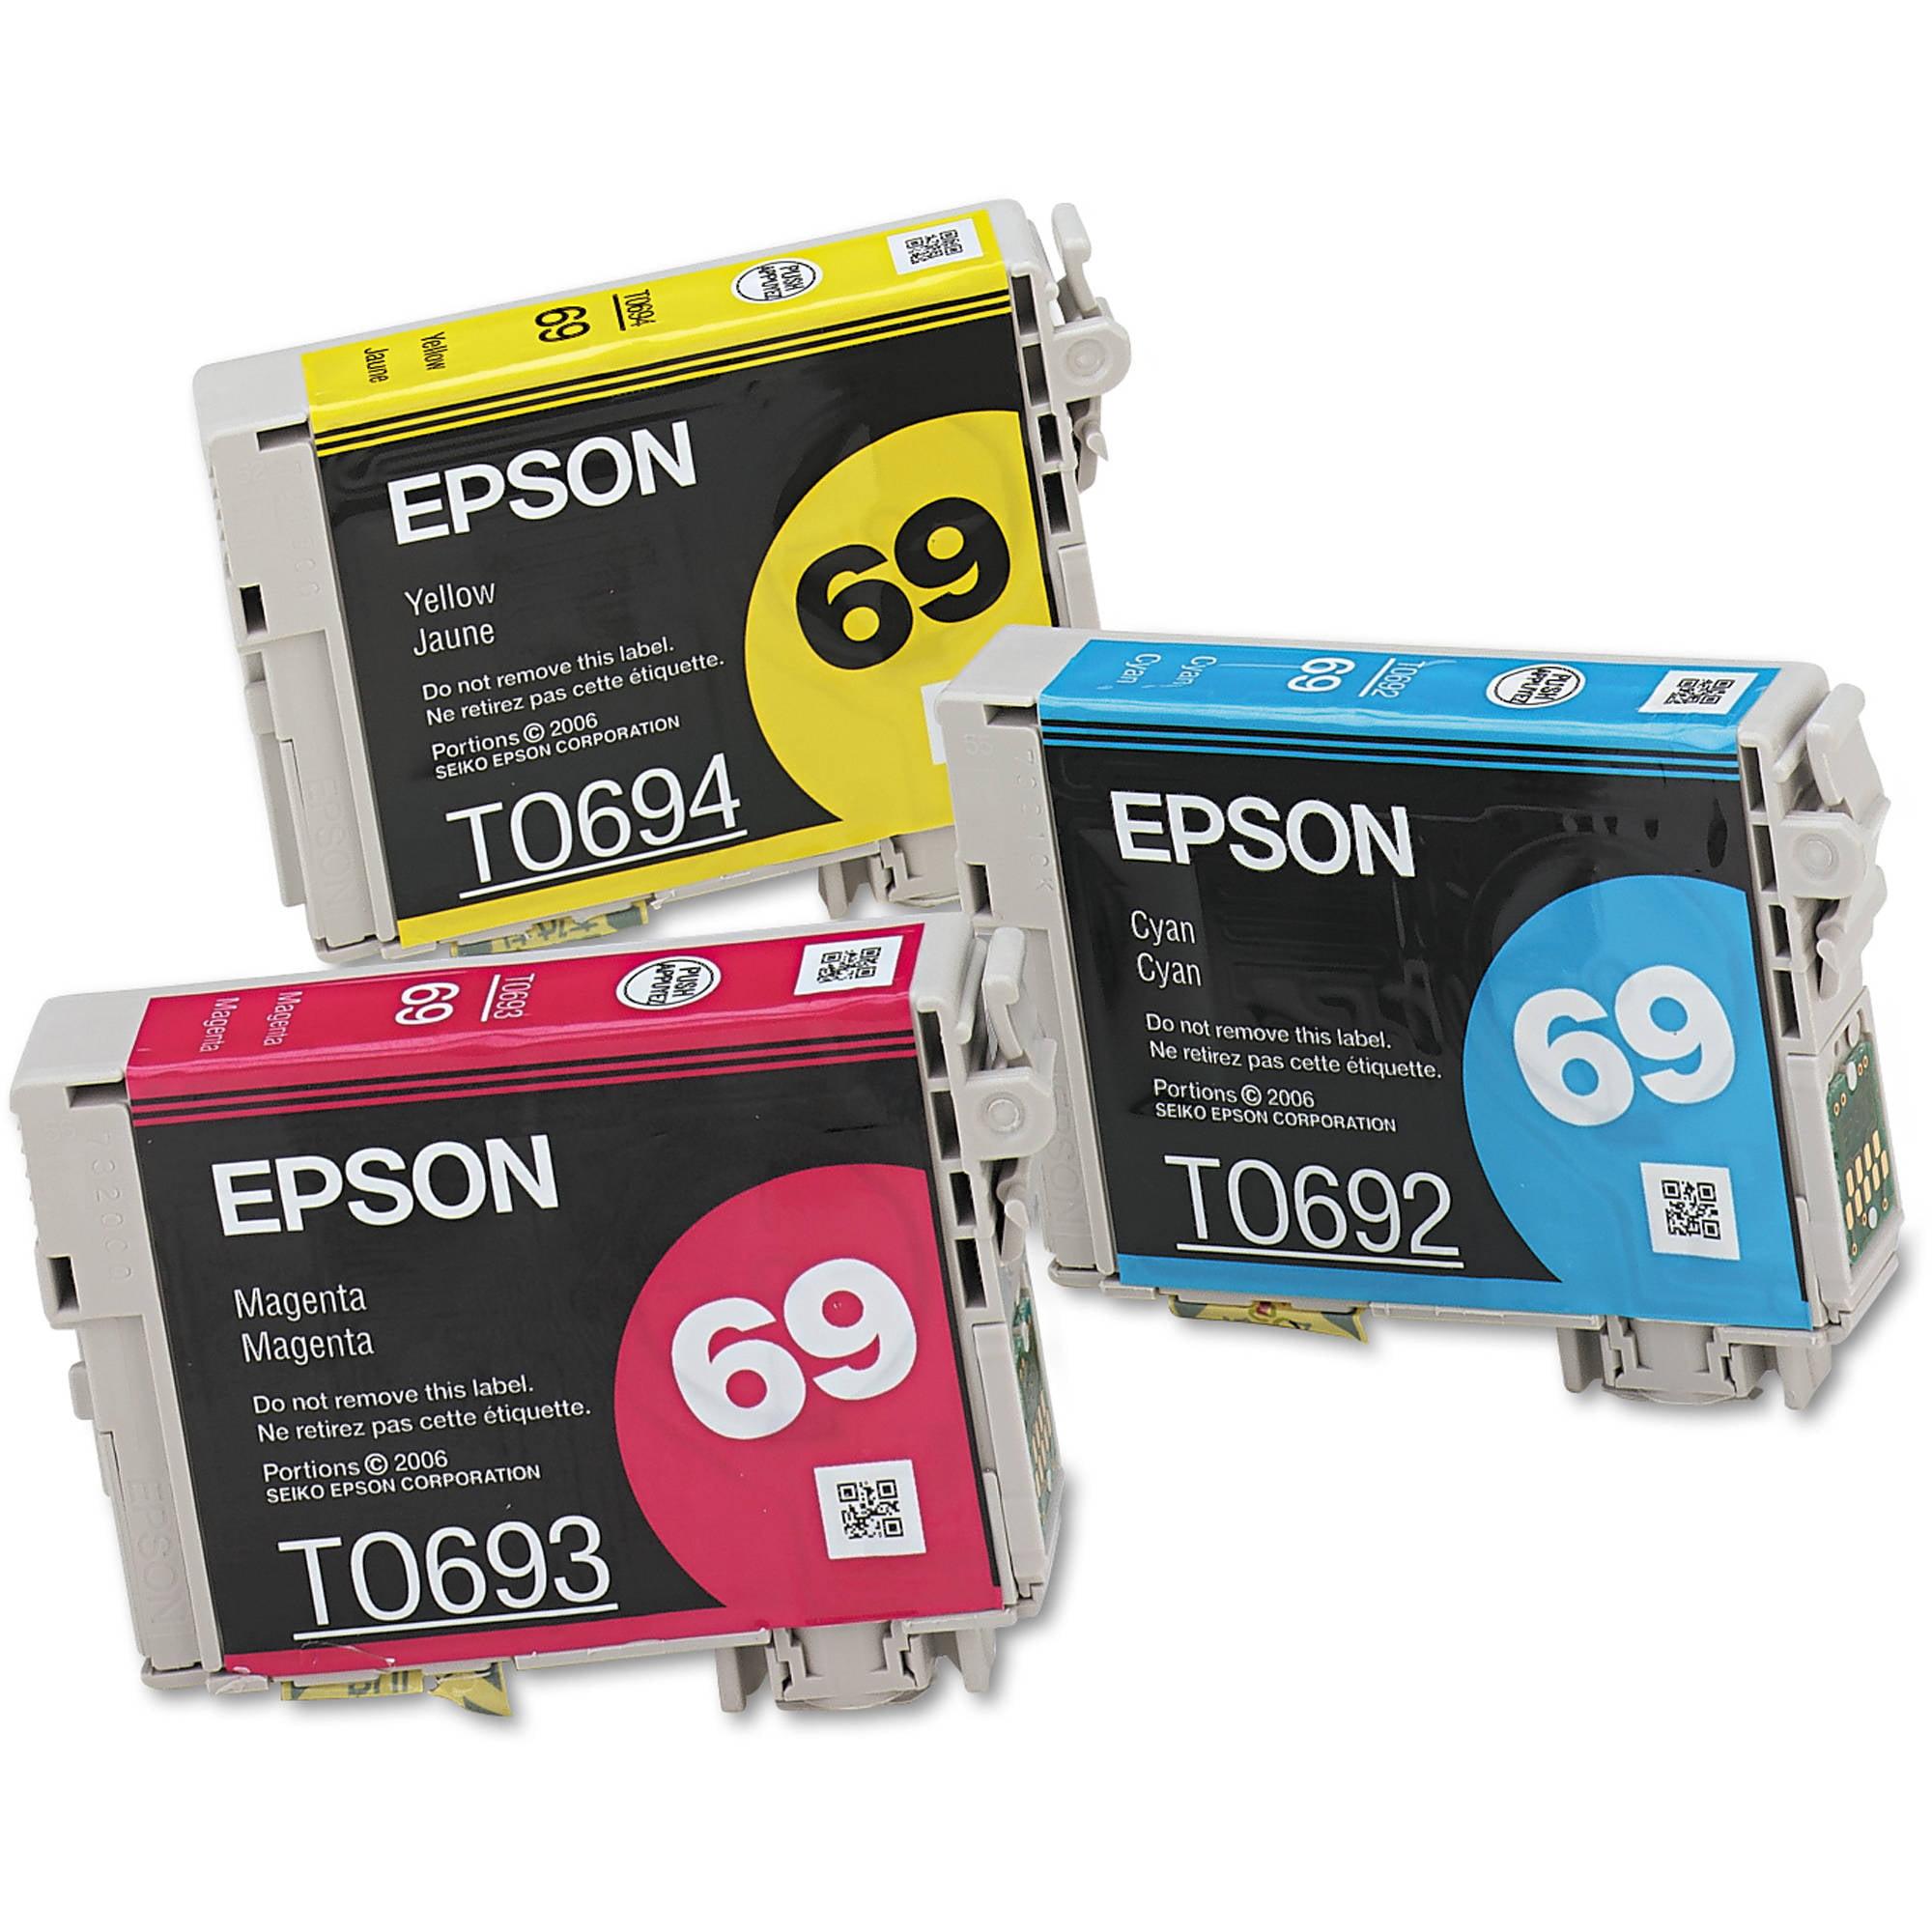 Epson DuraBrite Ultra Ink Multipack for Stylus CX5000, CX6000, CX8400, CX9400 (T069520)